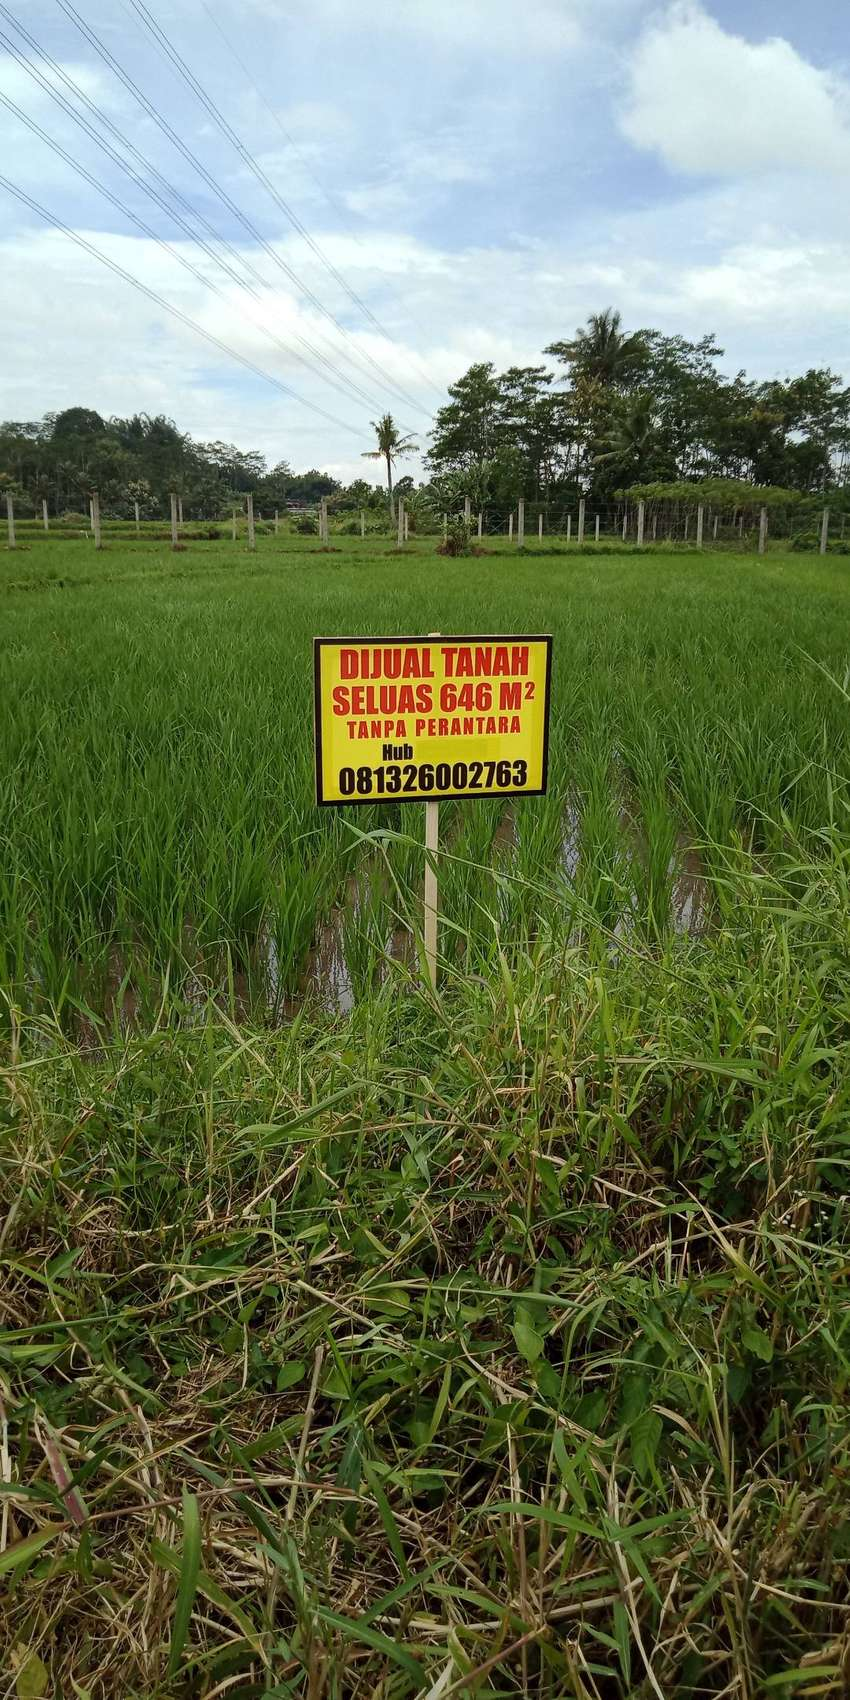 Jual tanah pinggir jalan raya. Cocok untuk usaha rumah atau gudang